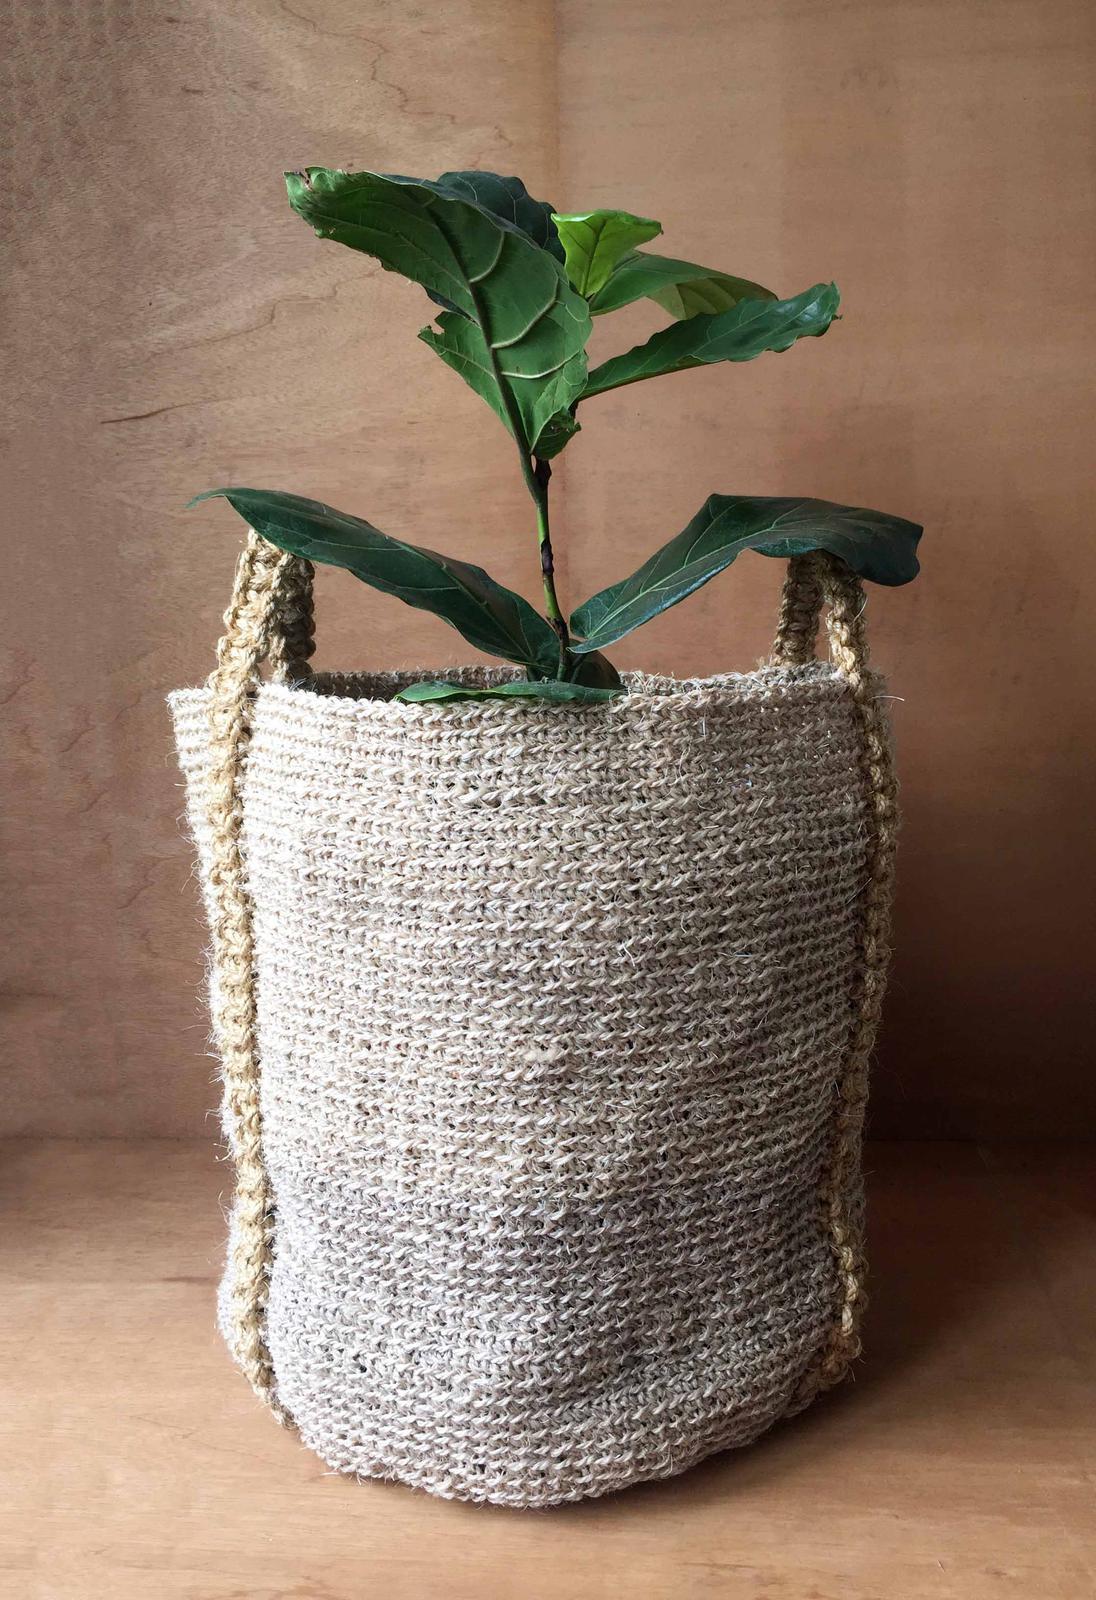 Sisal basket large (basket only)